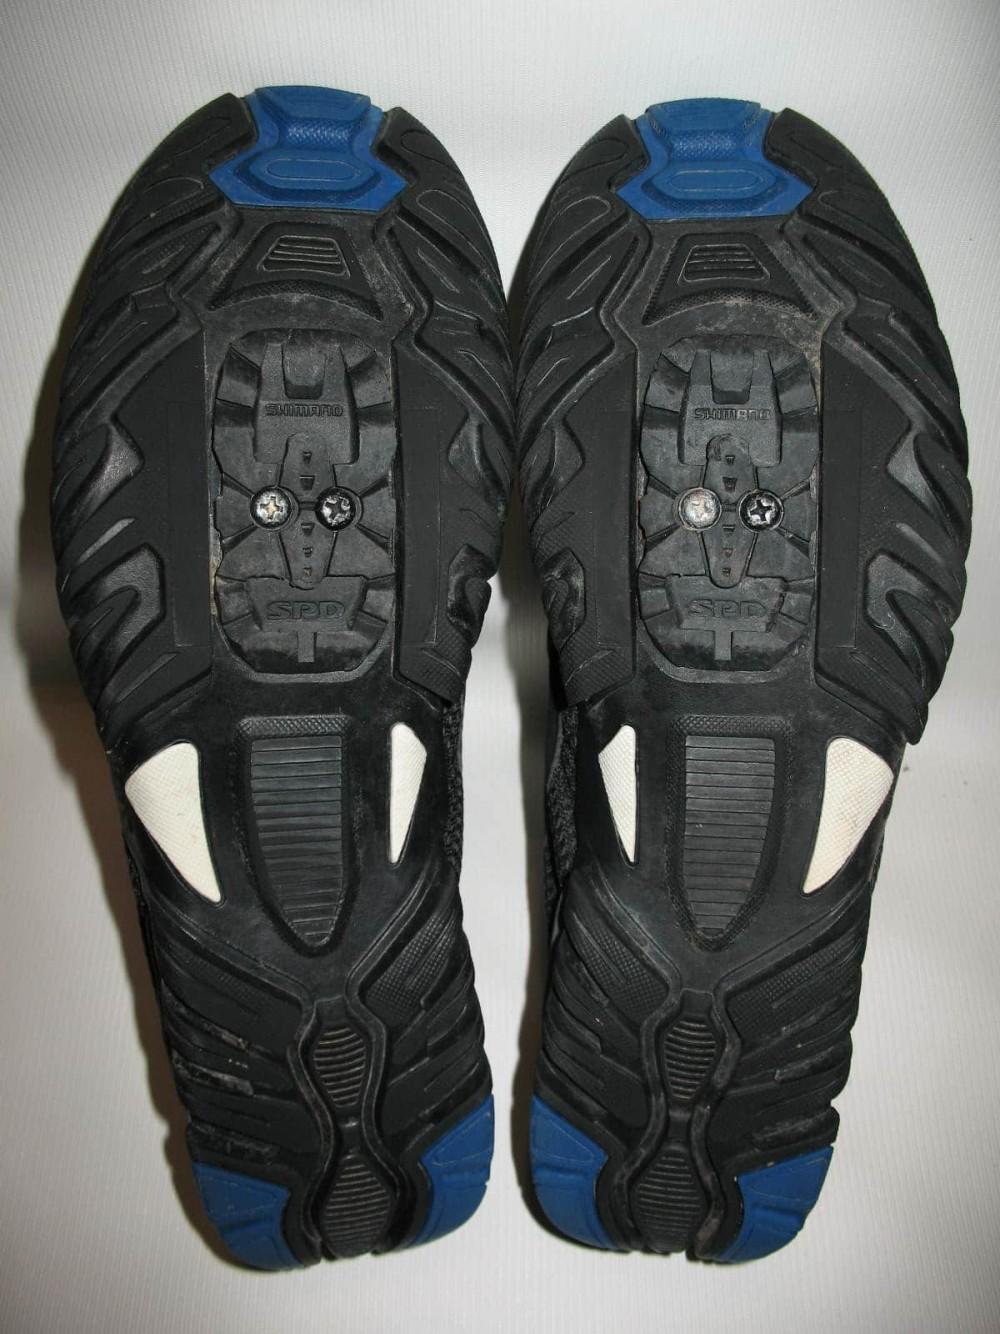 Велотуфли SHIMANO sh-mt33 mtb shoes (размер EU42(на стопу до 265 mm)) - 7